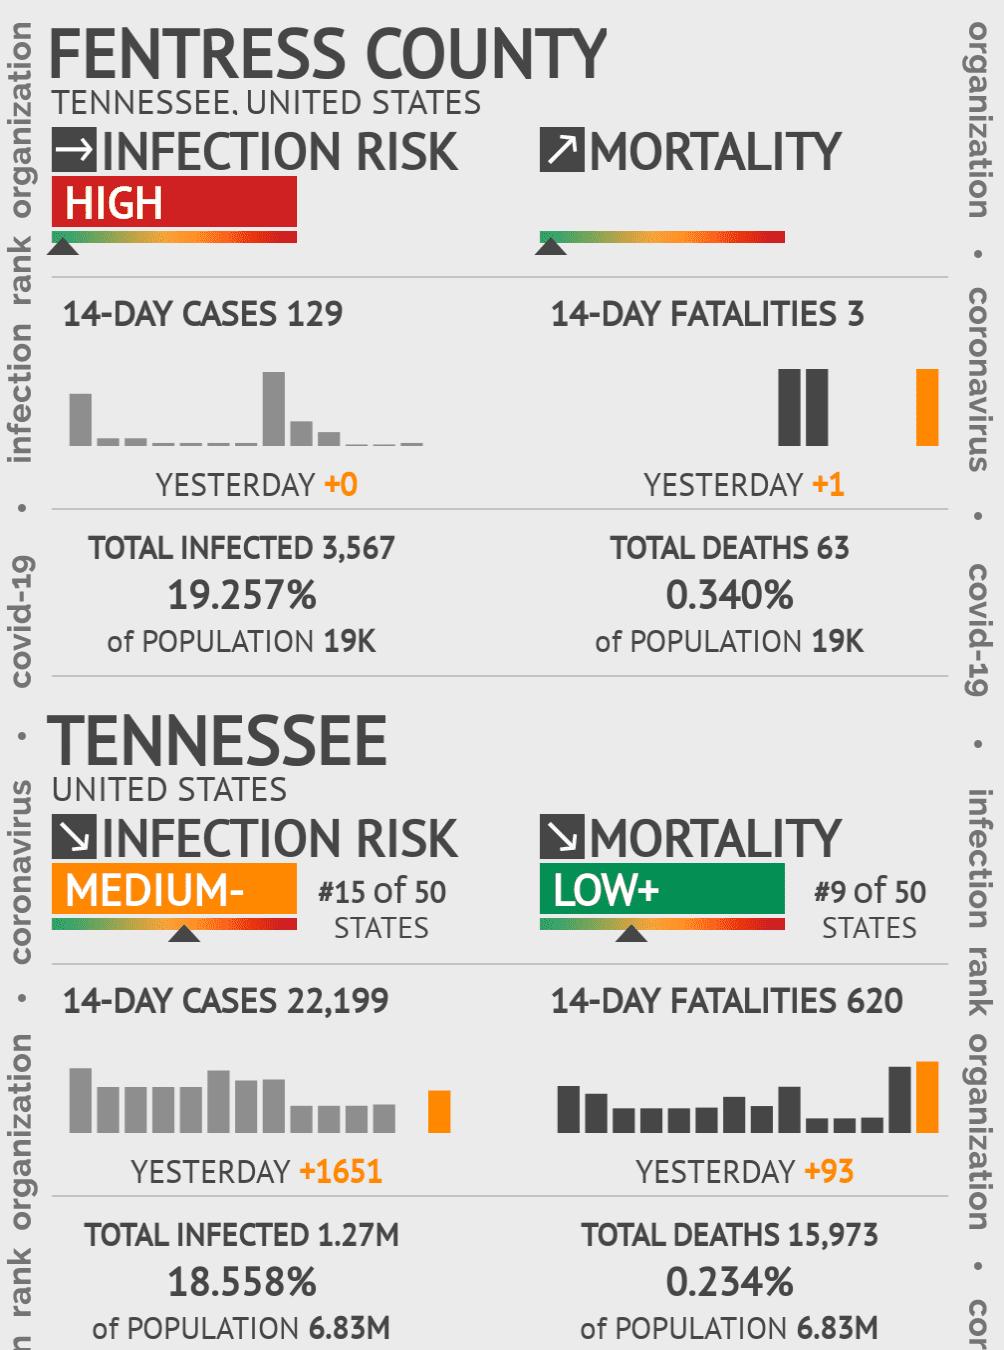 Fentress County Coronavirus Covid-19 Risk of Infection on January 20, 2021